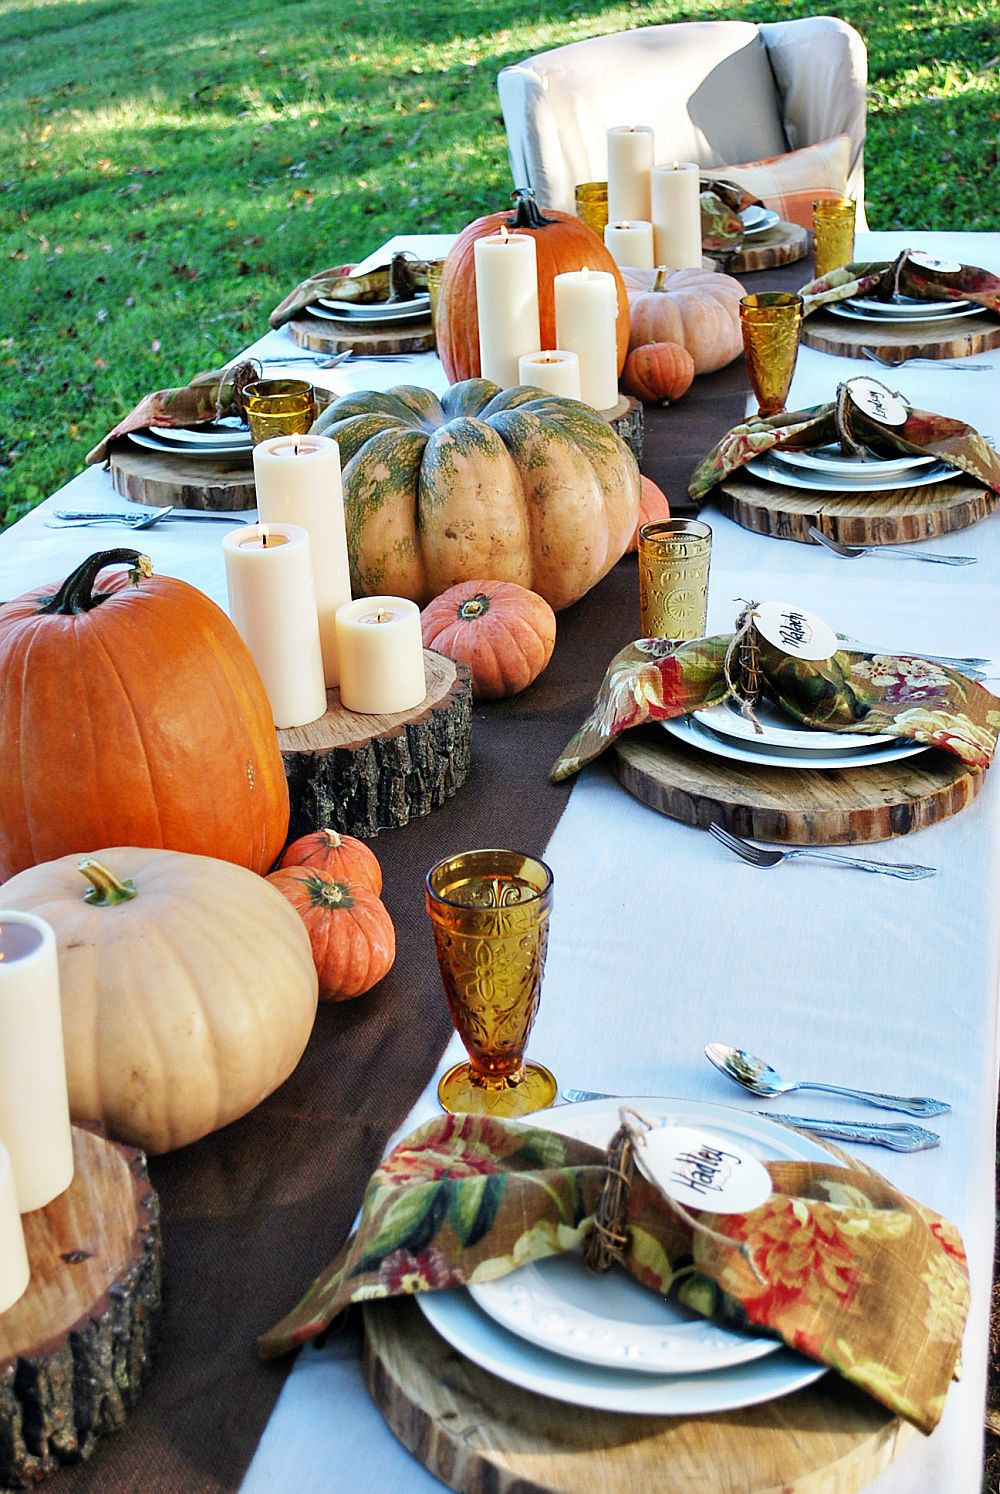 Thanksgiving Dinner Table Settings  15 Outdoor Thanksgiving Table Settings for Dining Alfresco